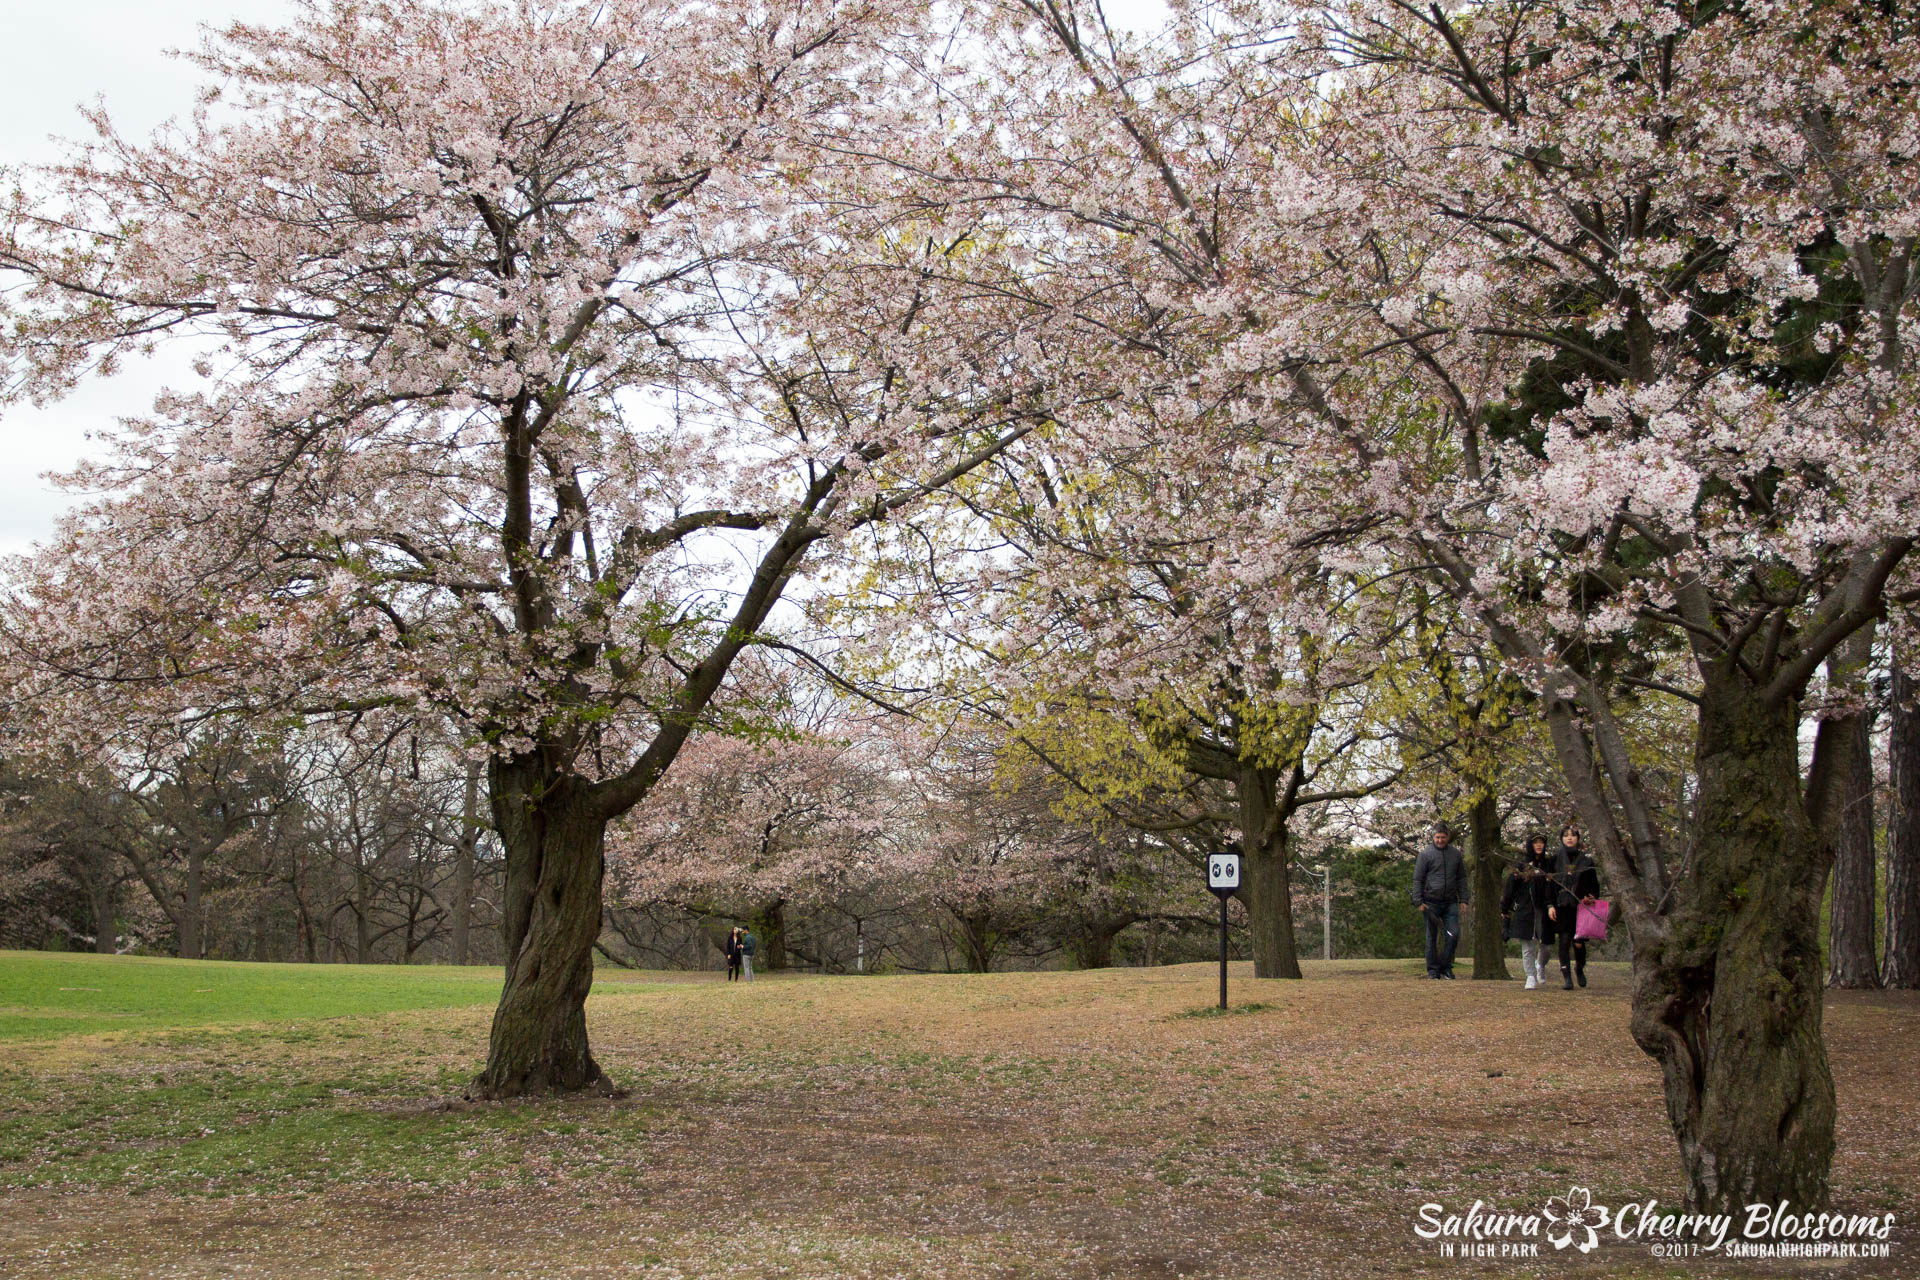 Sakura-Watch-May-2-2017-cherry-blossoms-falling-in-High-Park-5.jpg